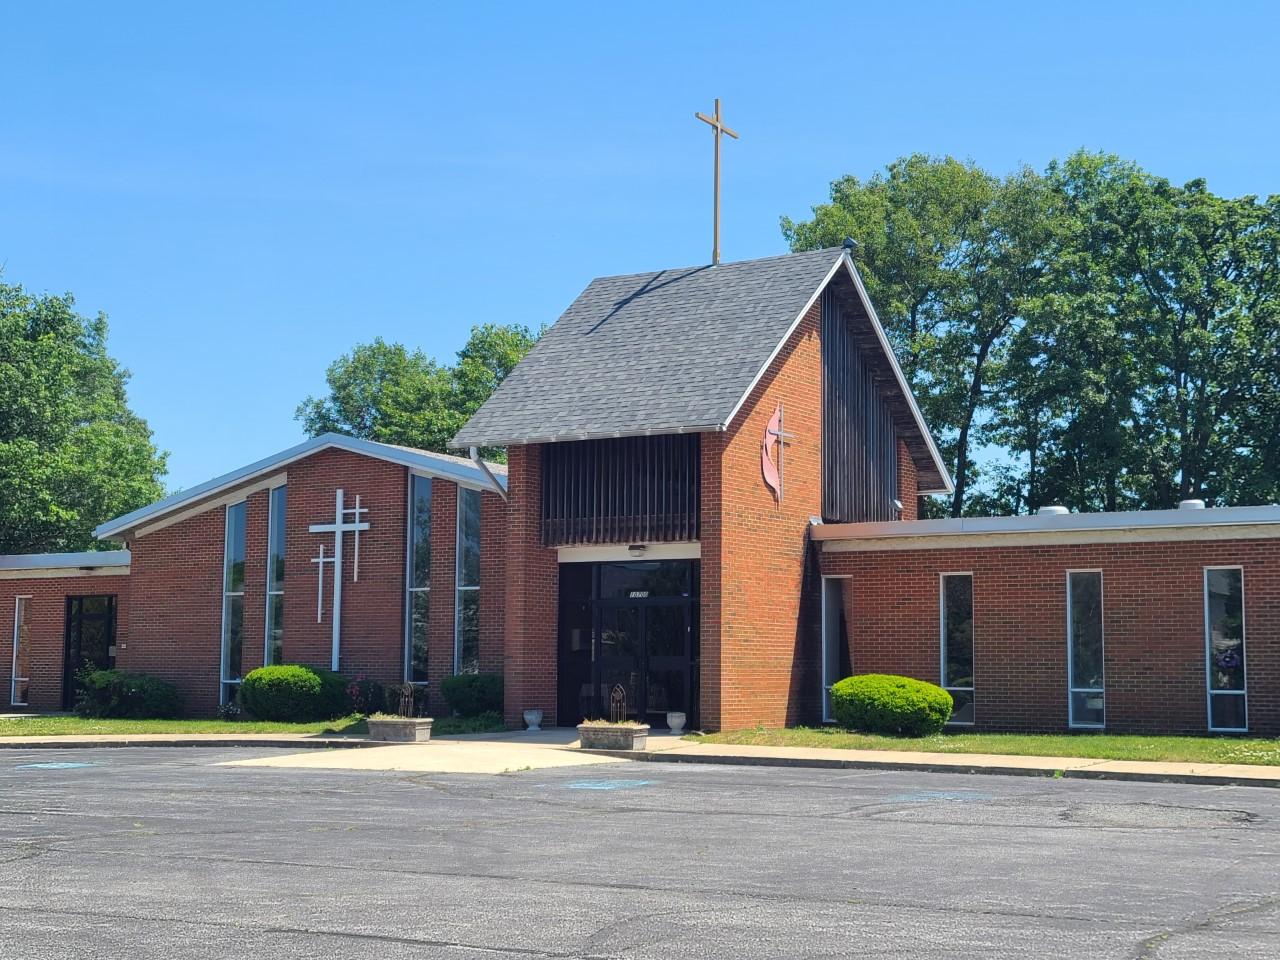 Image of Clinton United Methodist Church